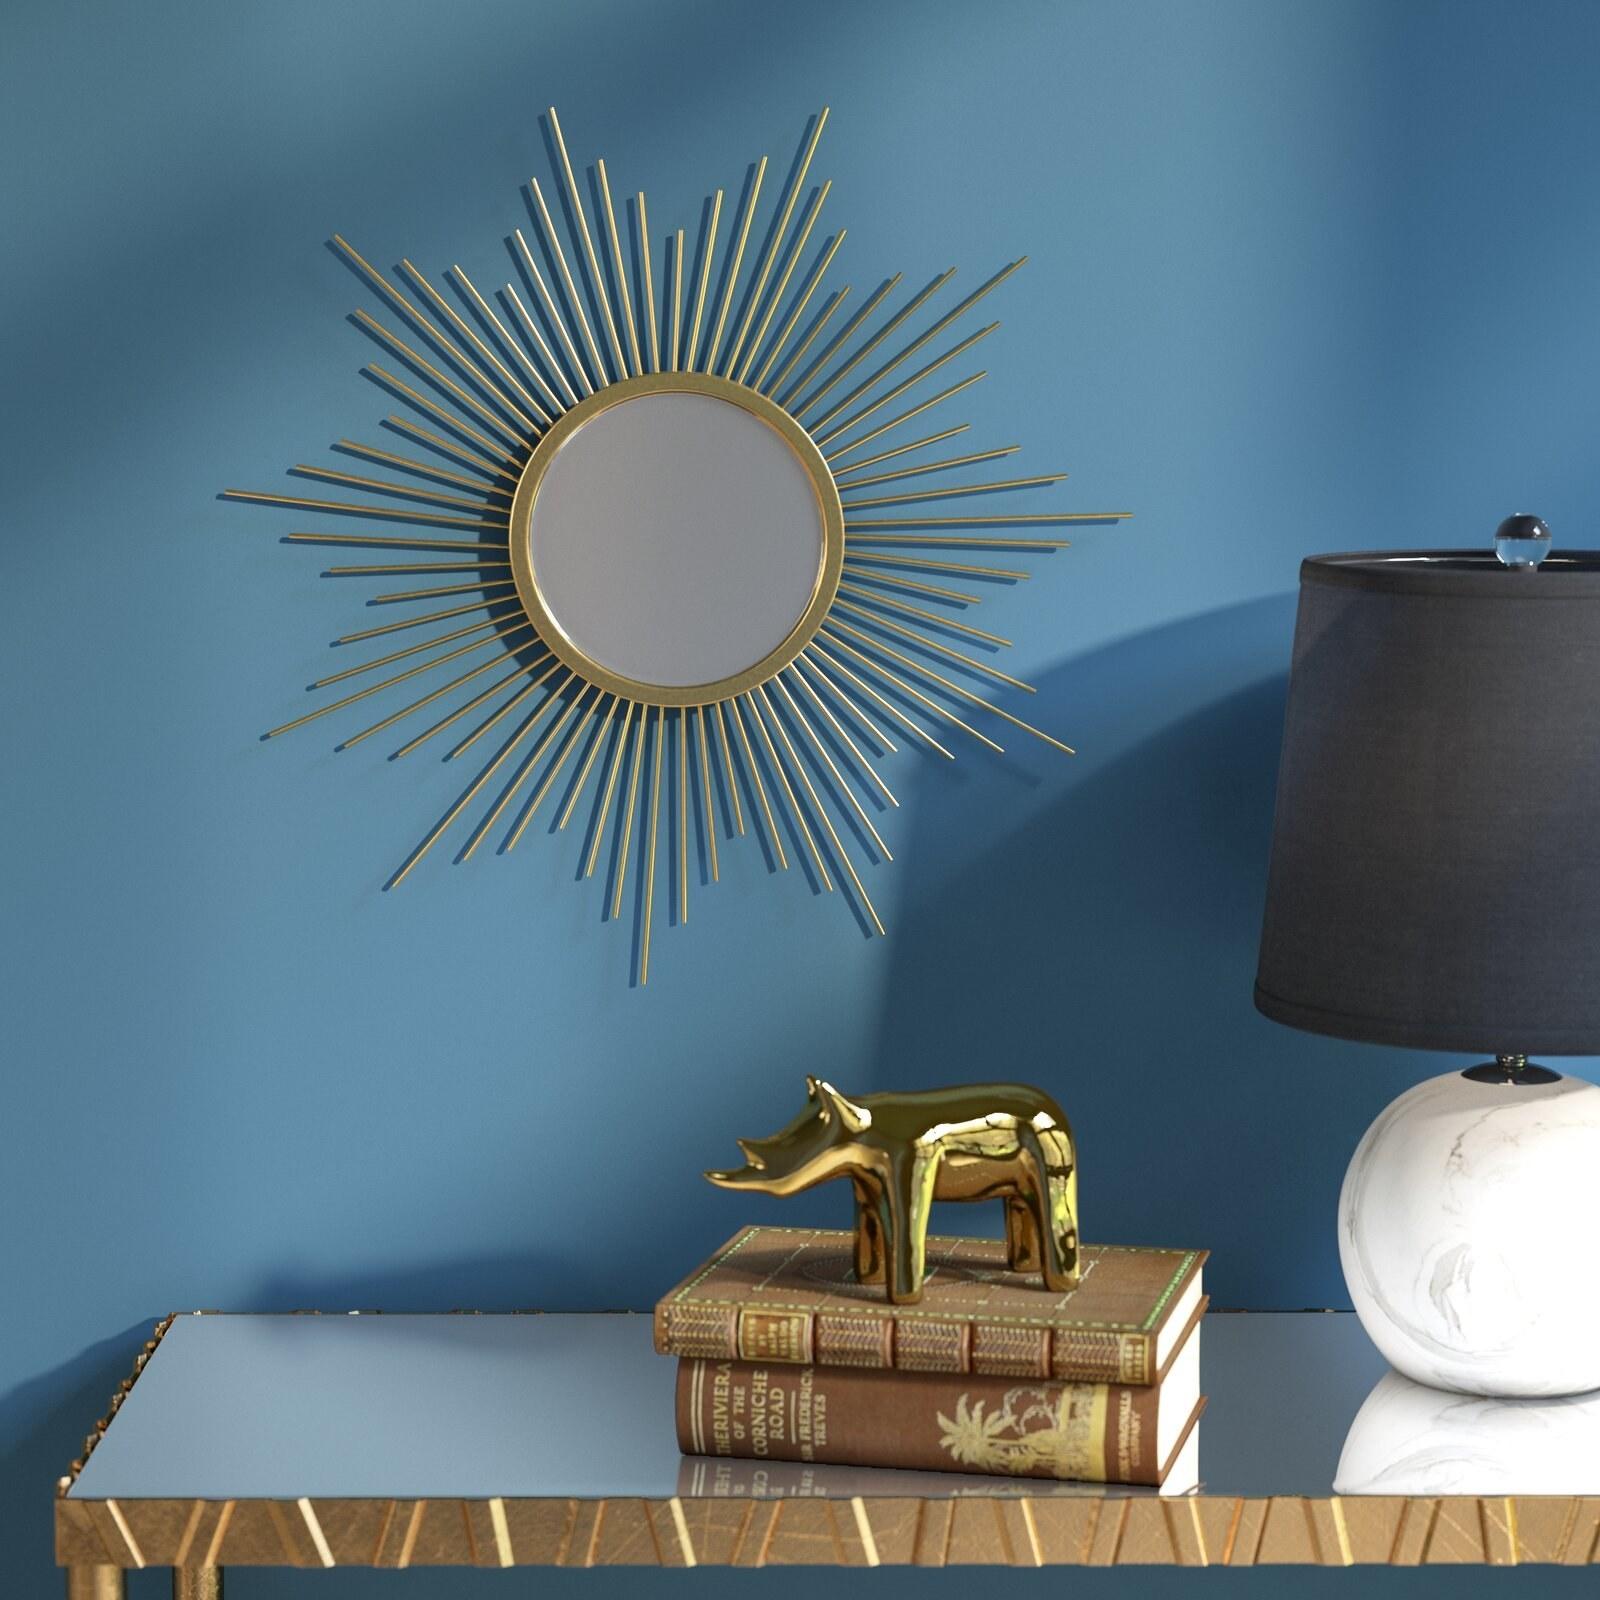 gold accent sunburst mirror on a blue wall